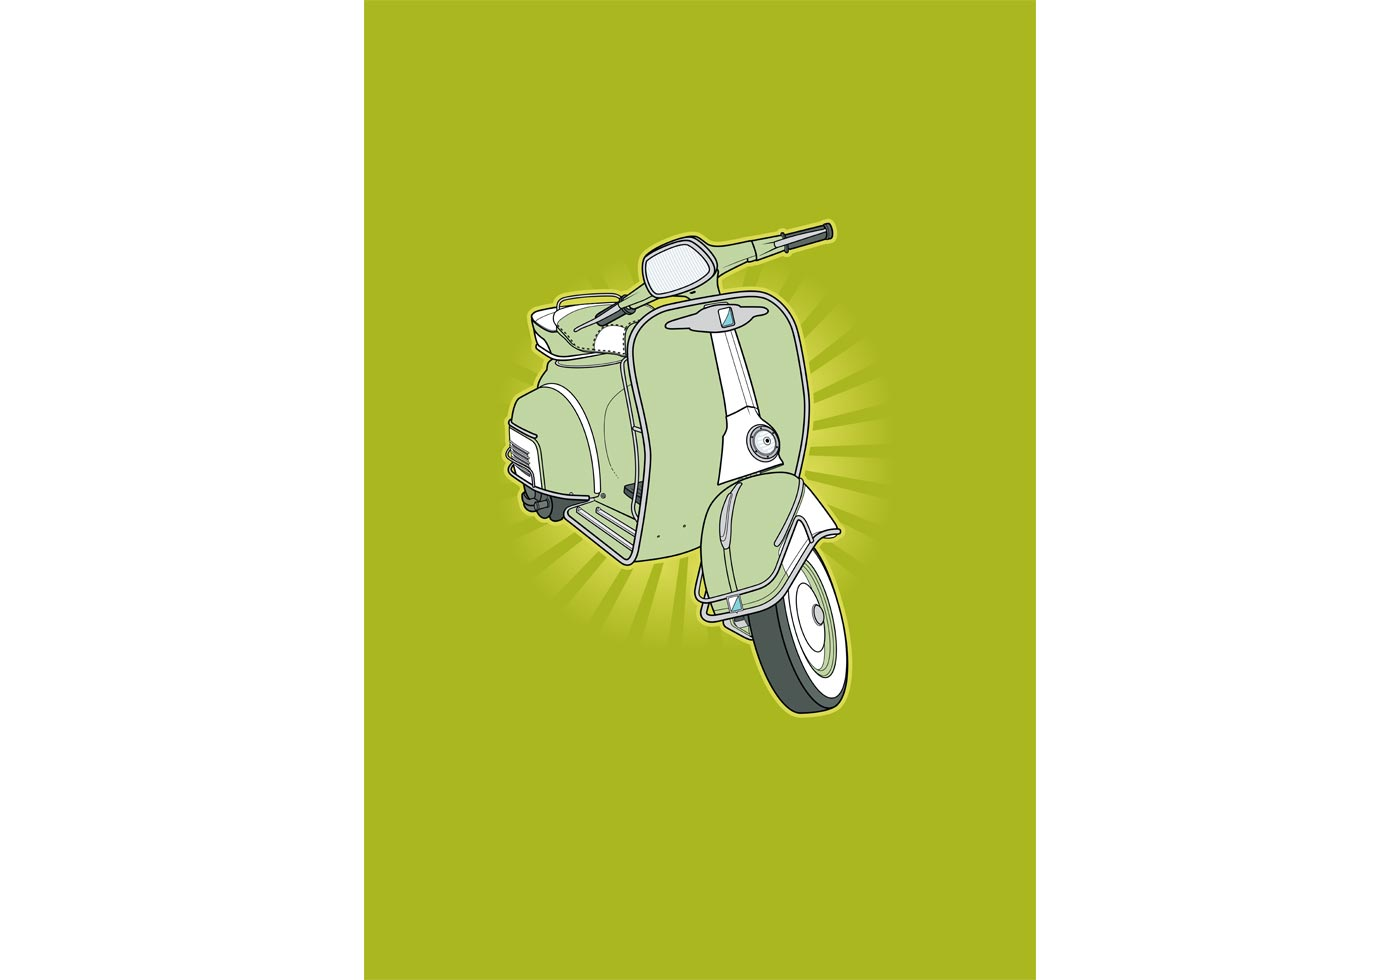 Retro Vespa - Download Free Vector Art, Stock Graphics ...